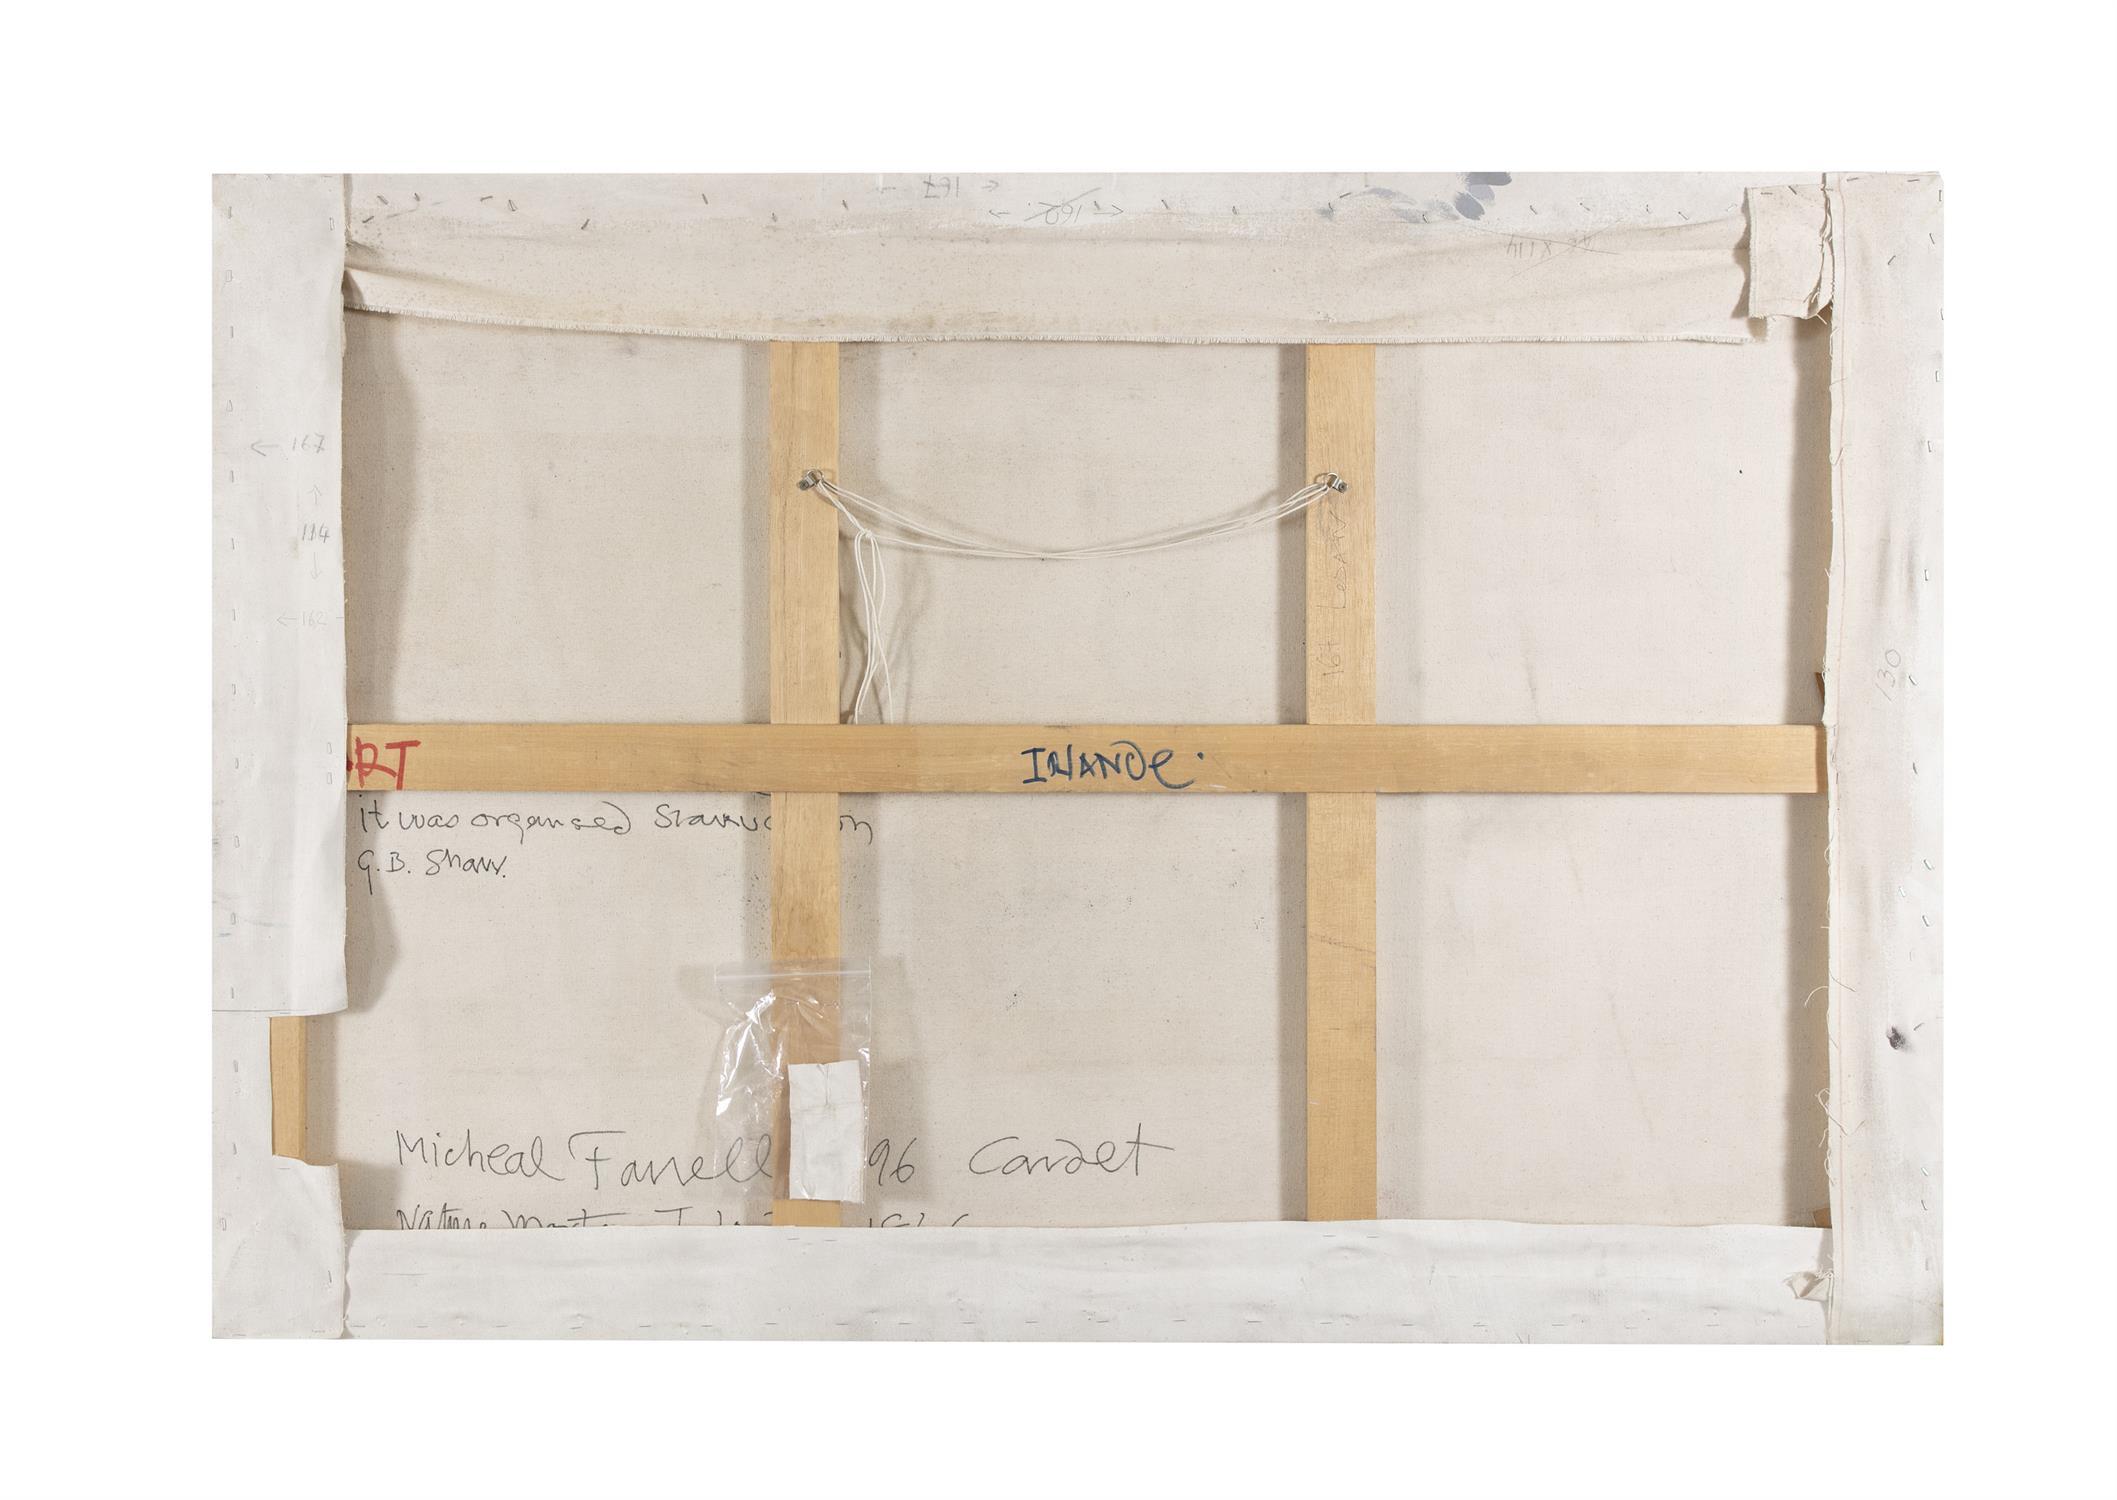 Michael Farrell (1940-2000) Nature Morte Irlande 1846 Oil on canvas, 114 x 167cm (44¾ x - Image 2 of 4